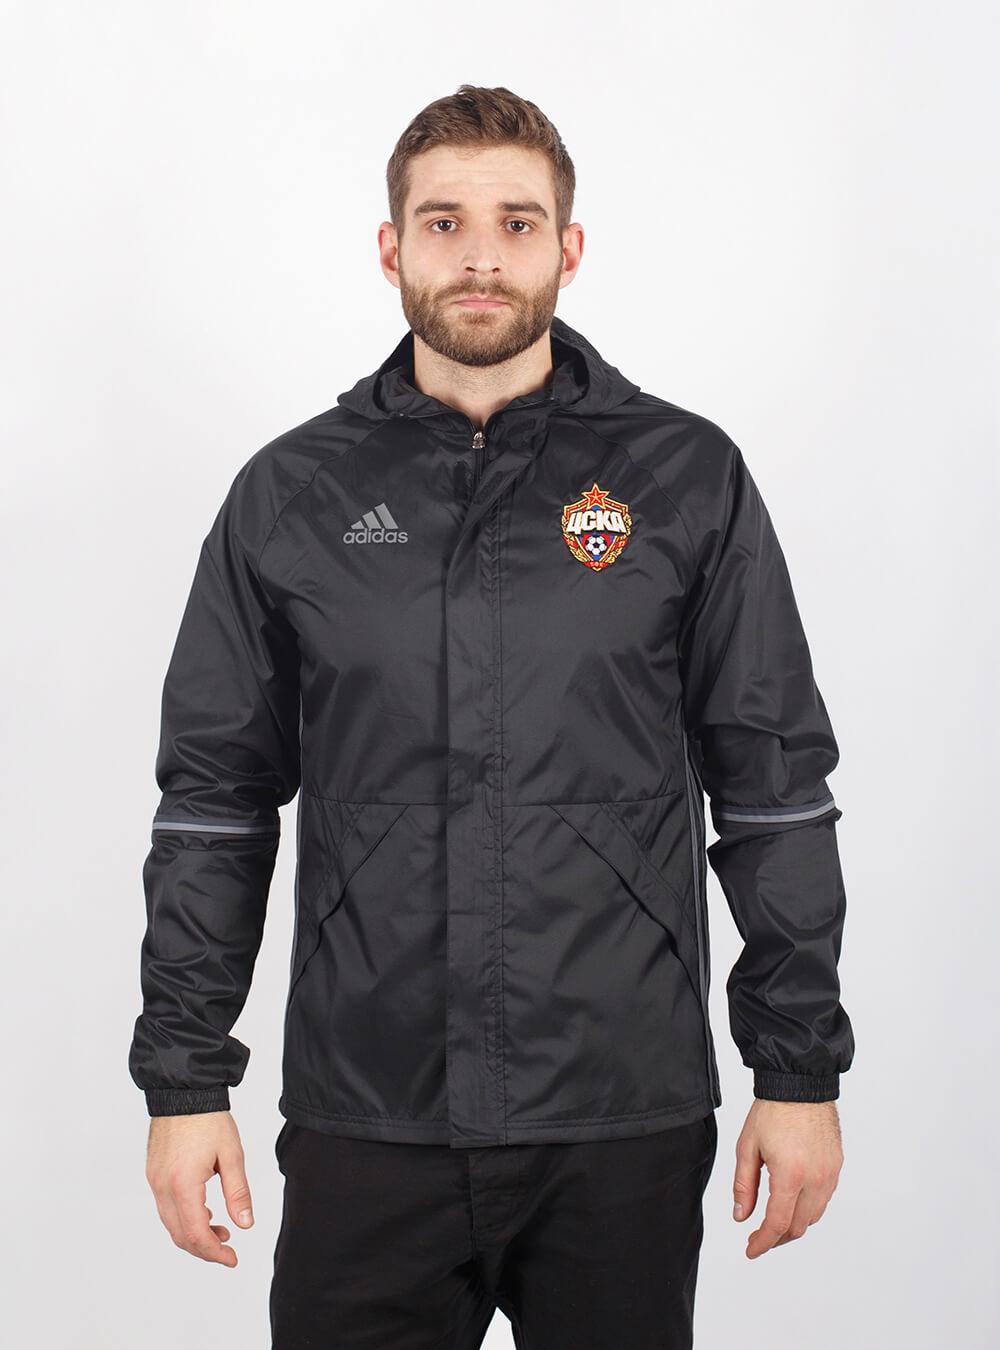 Куртка ветрозащитная (L)Распродажа Adidas<br>Куртка ветрозащитная<br>